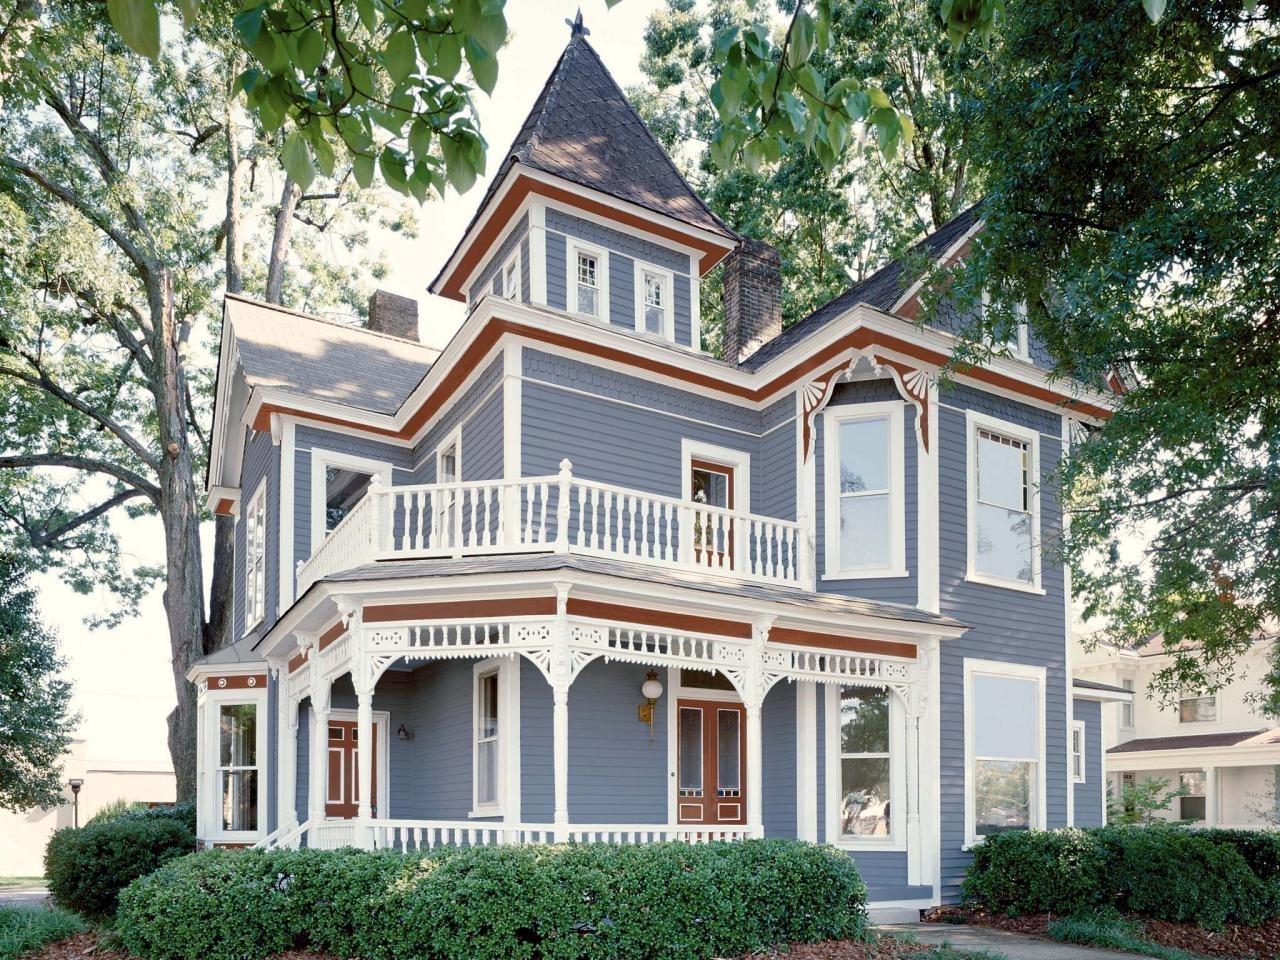 10 Ideal Exterior House Paint Color Ideas %name 2020